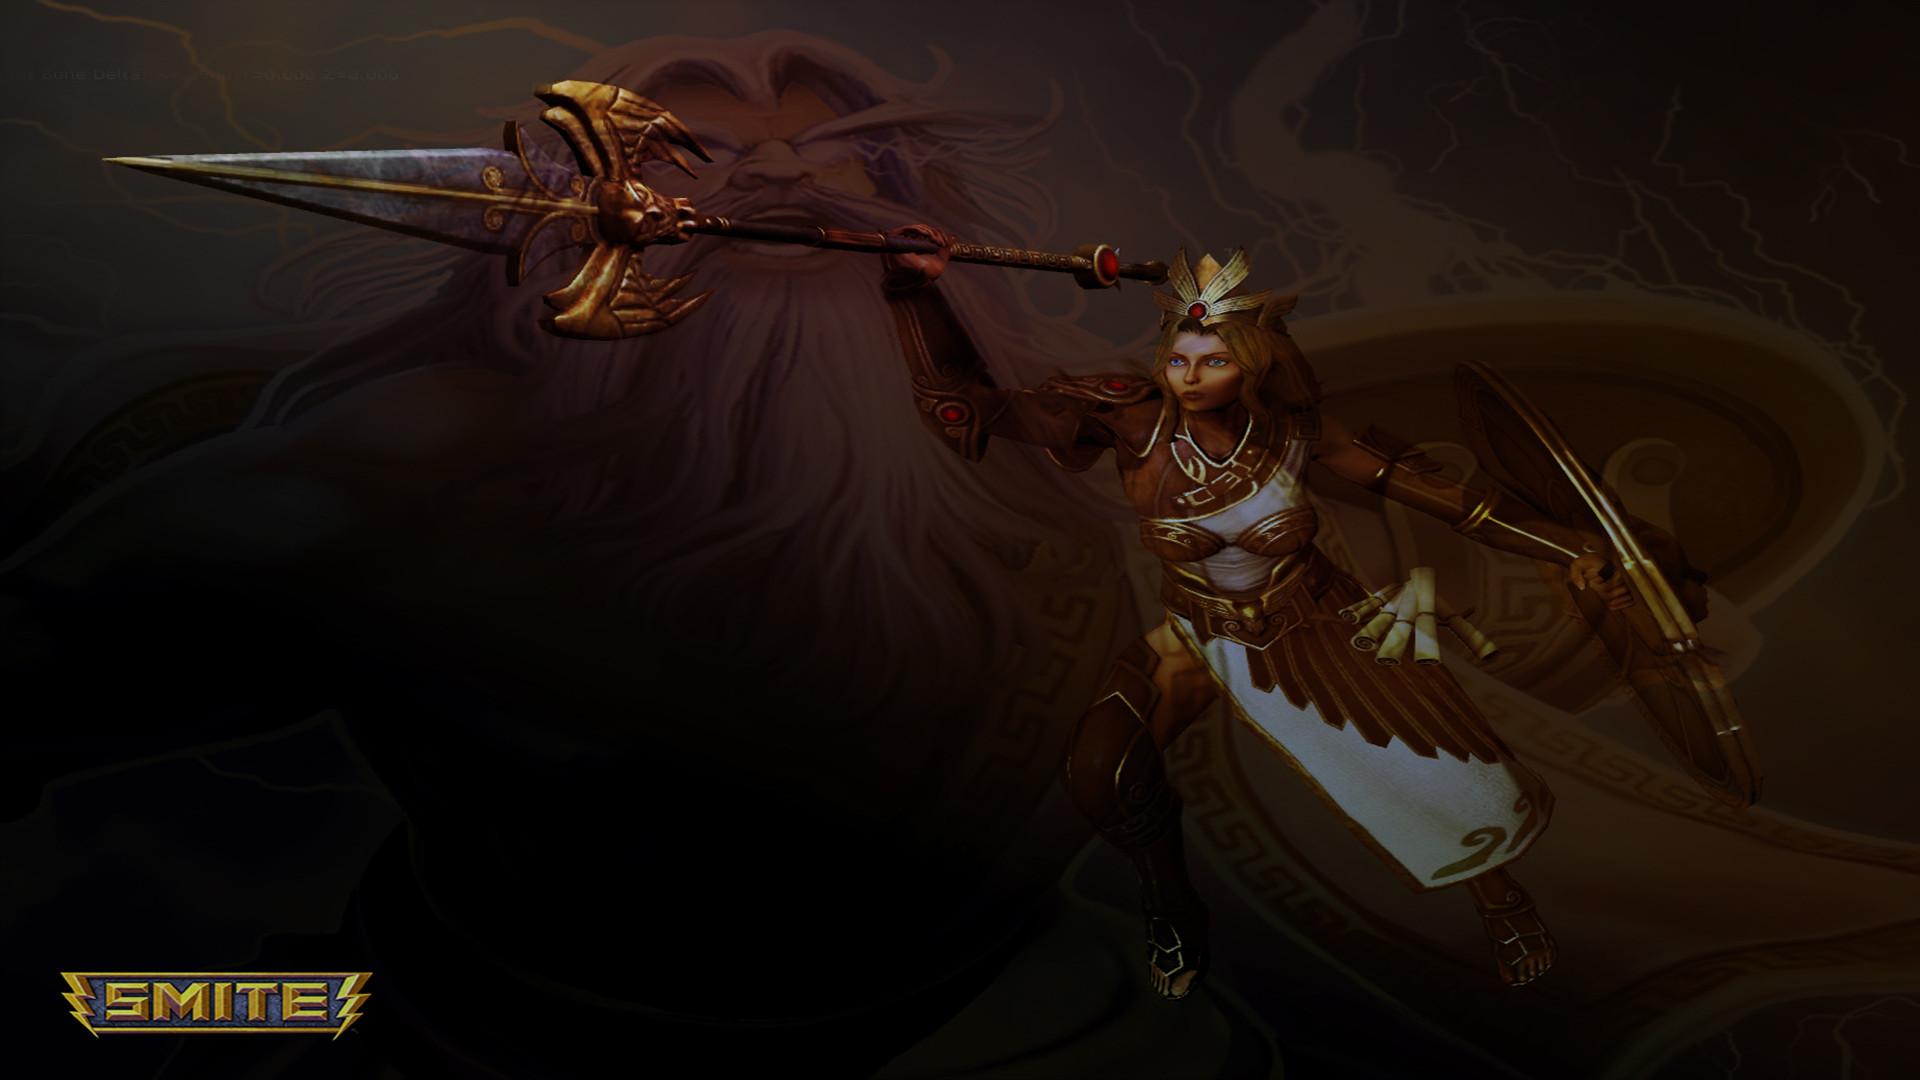 Can anyone create an Athena wallpaper?